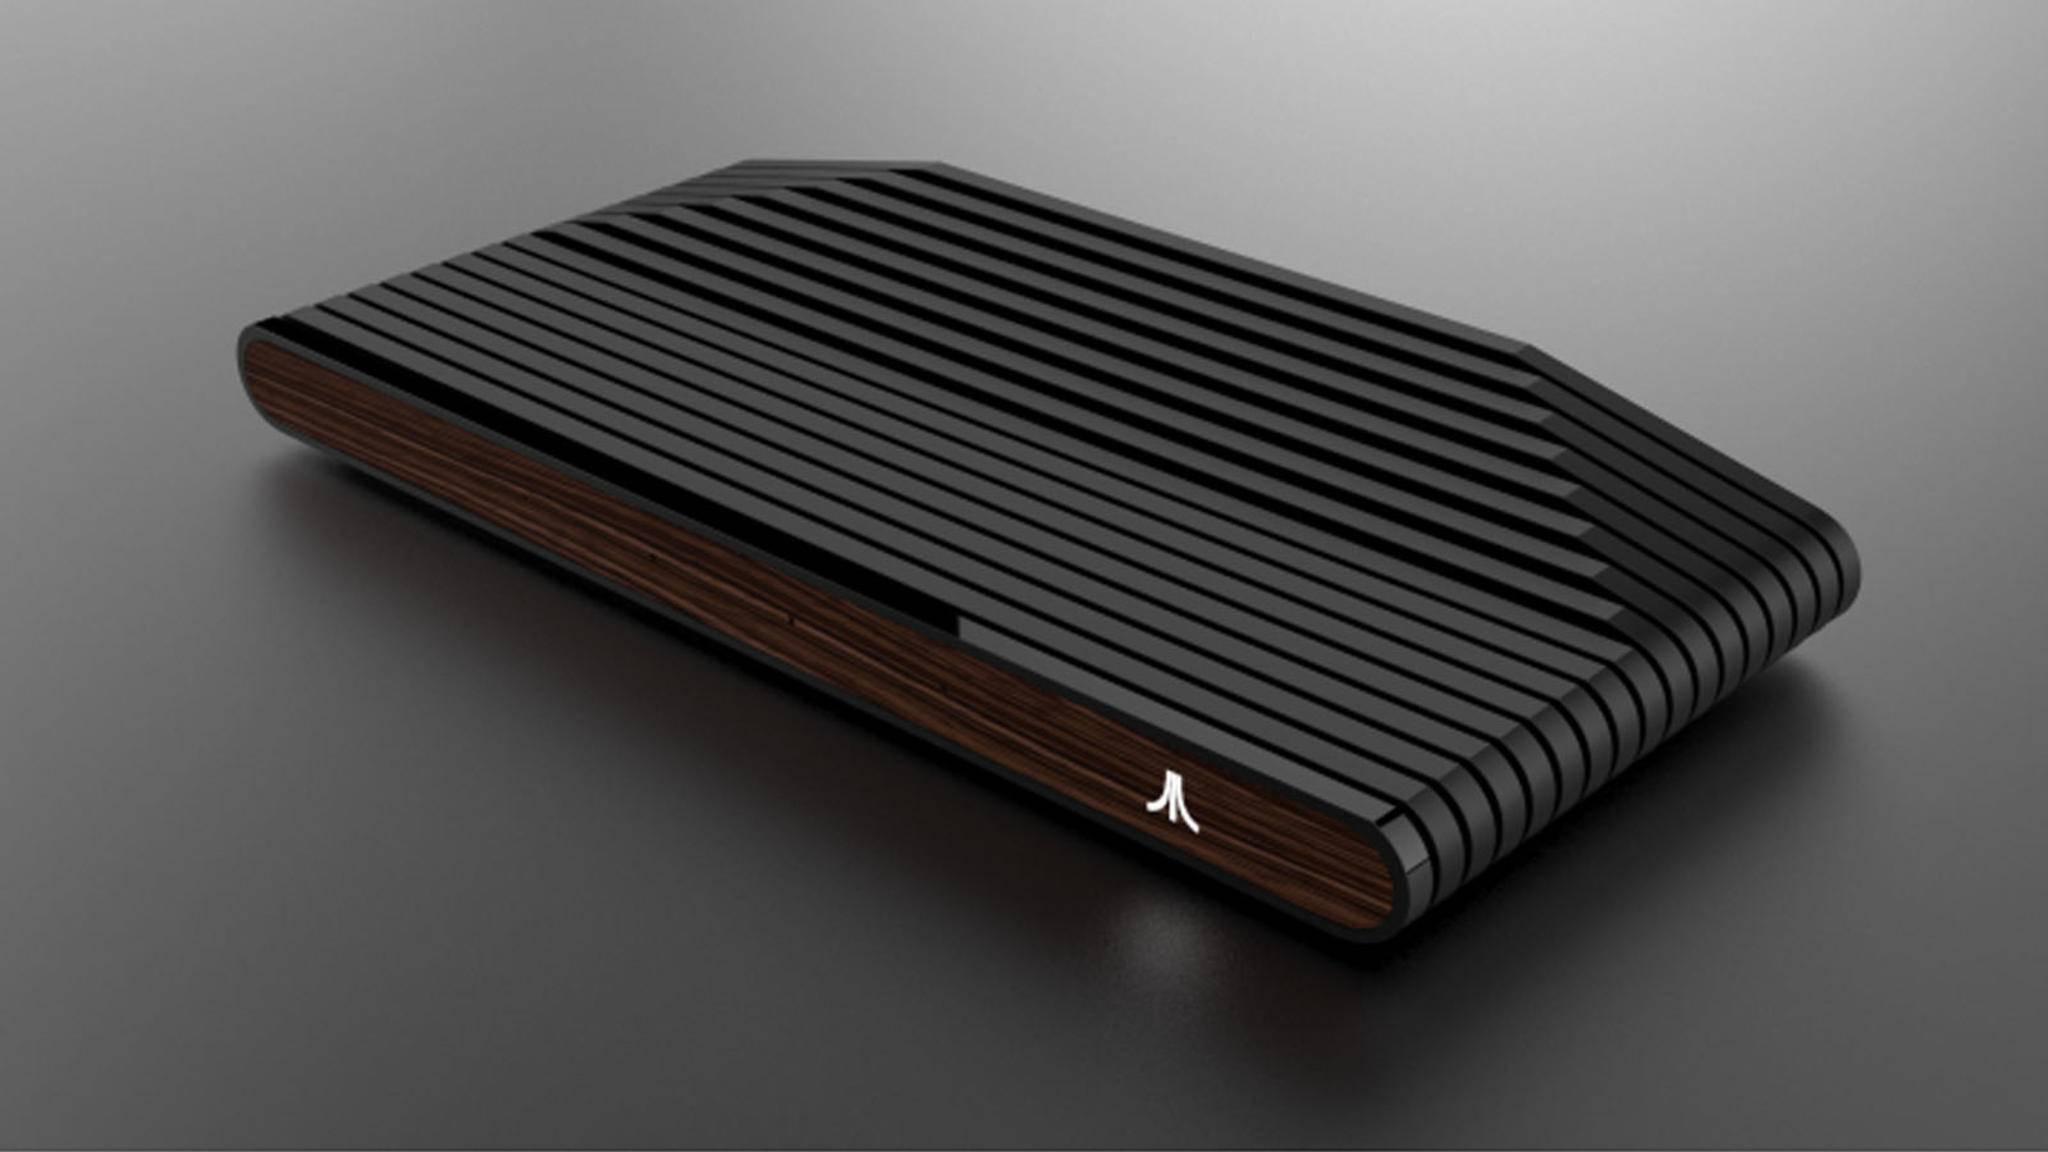 Ataribox kommt